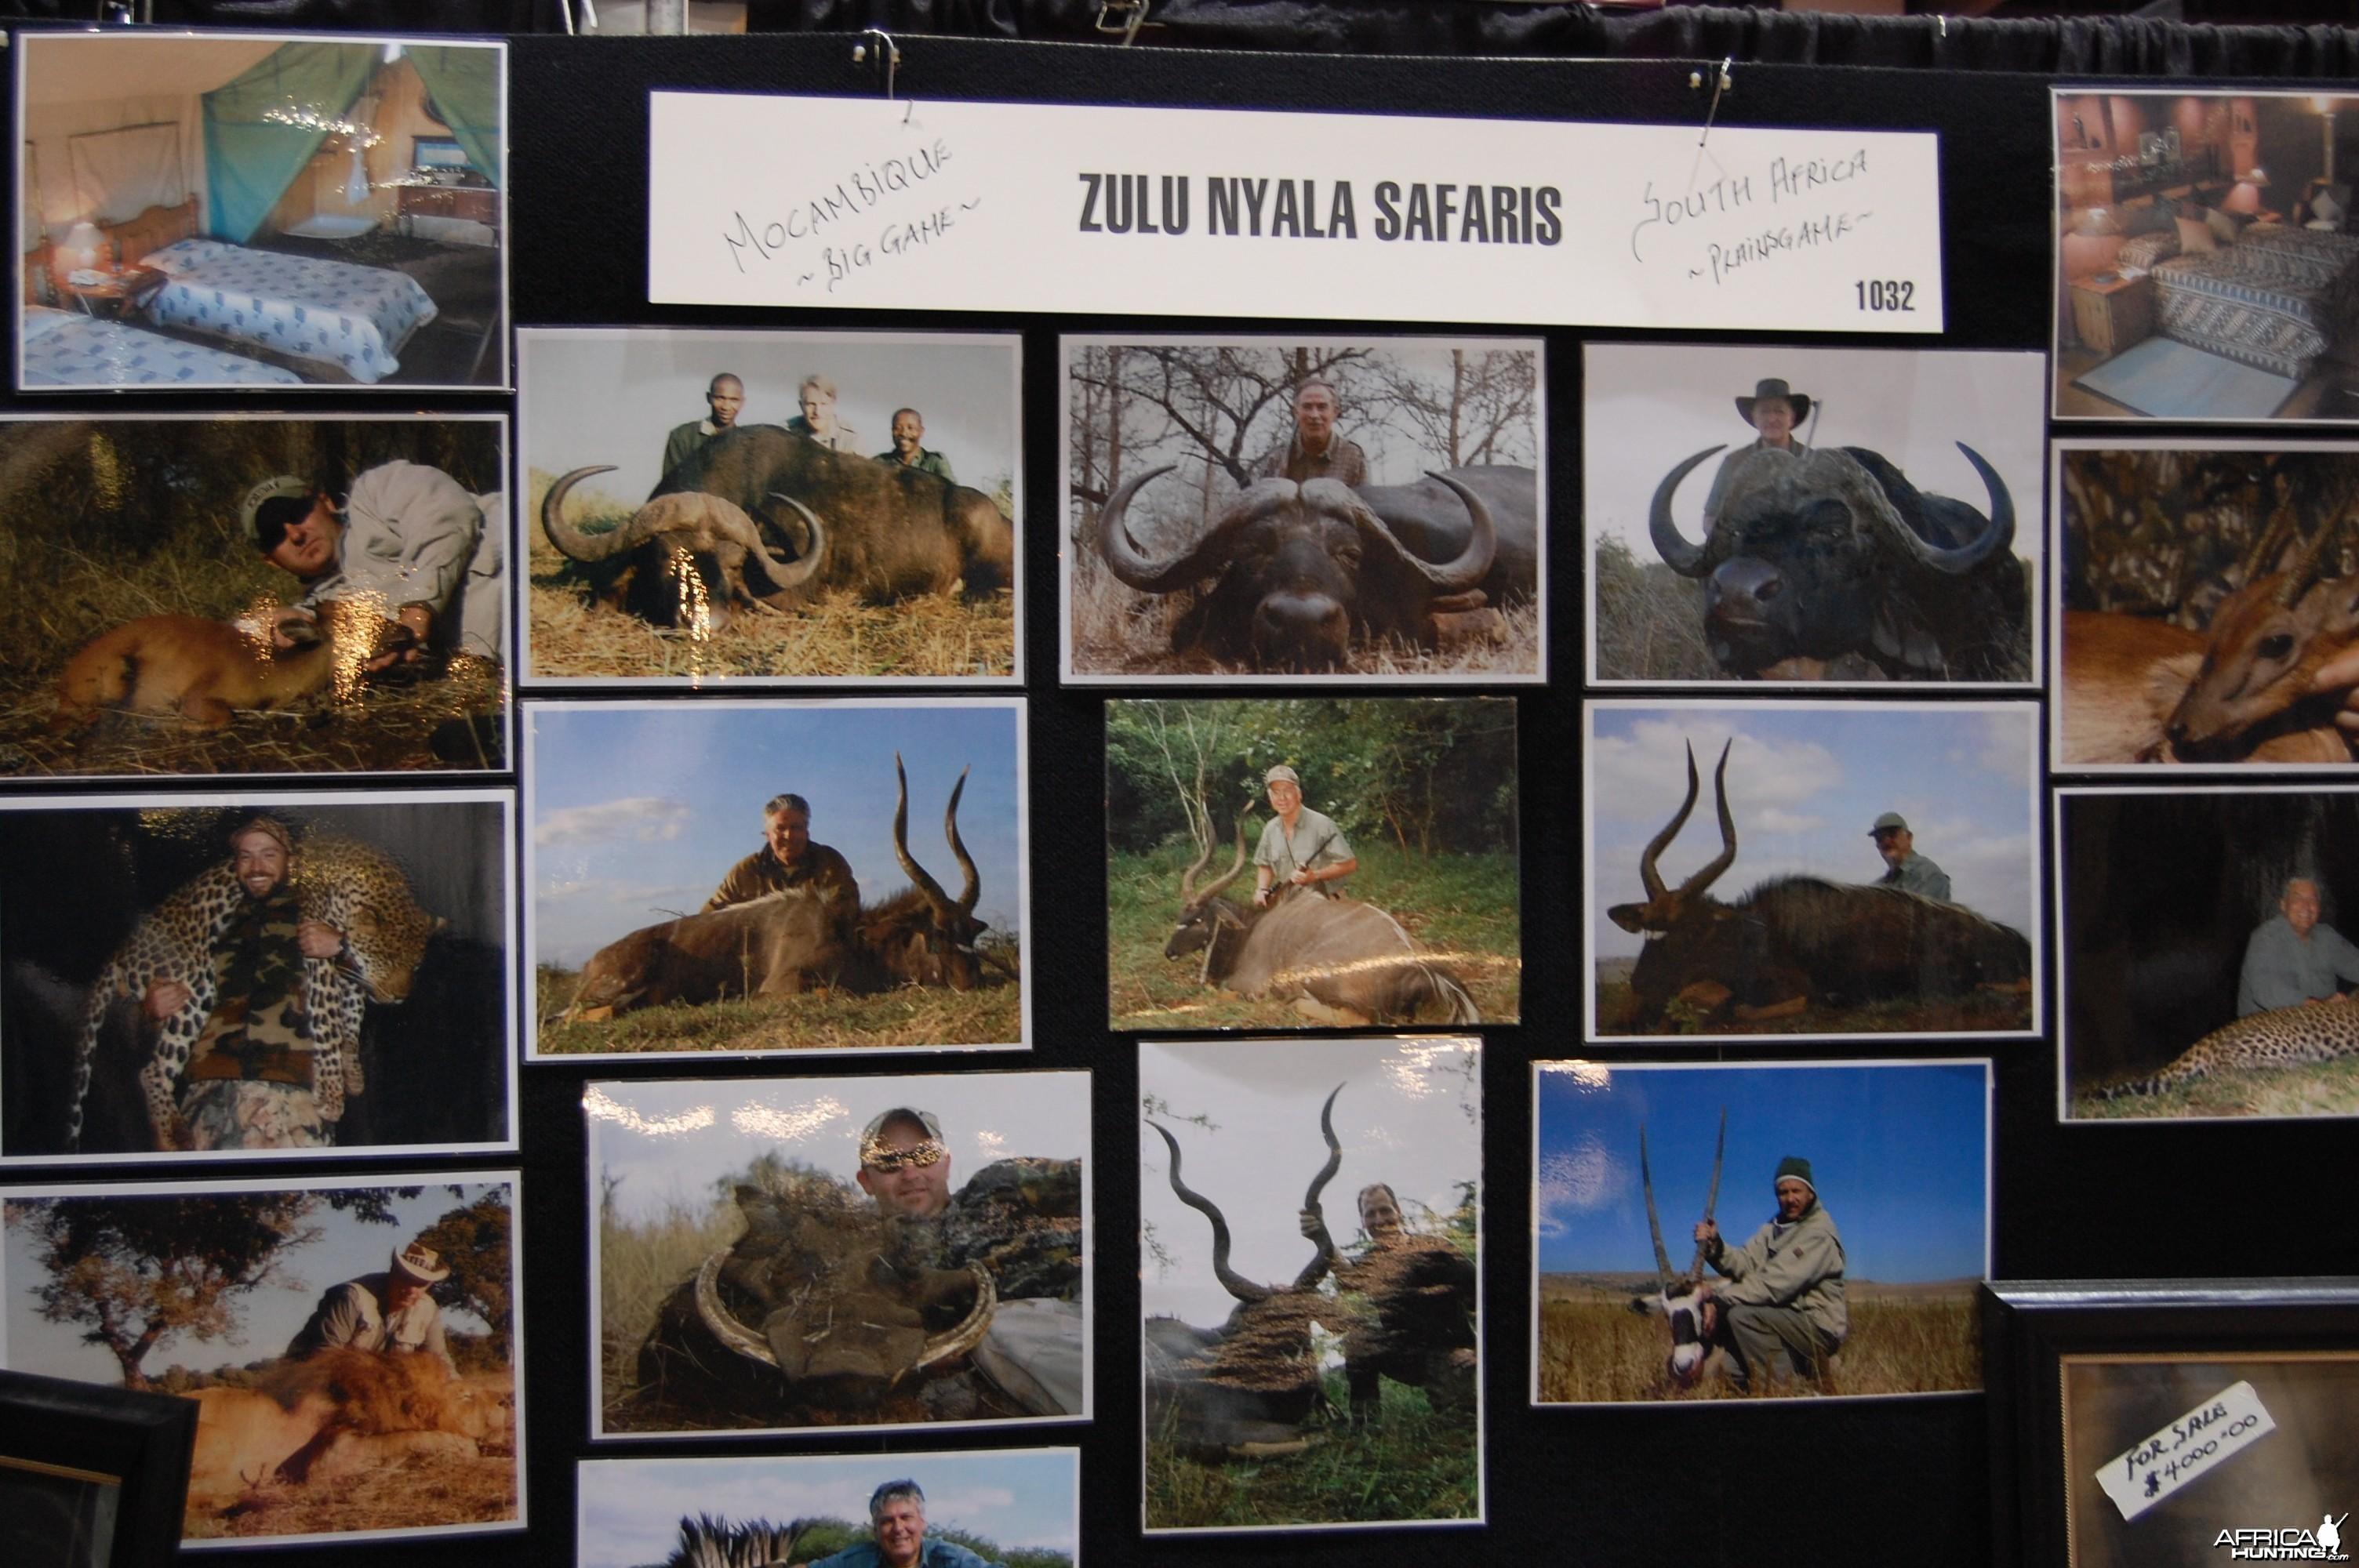 Zulu Nyala Safaris